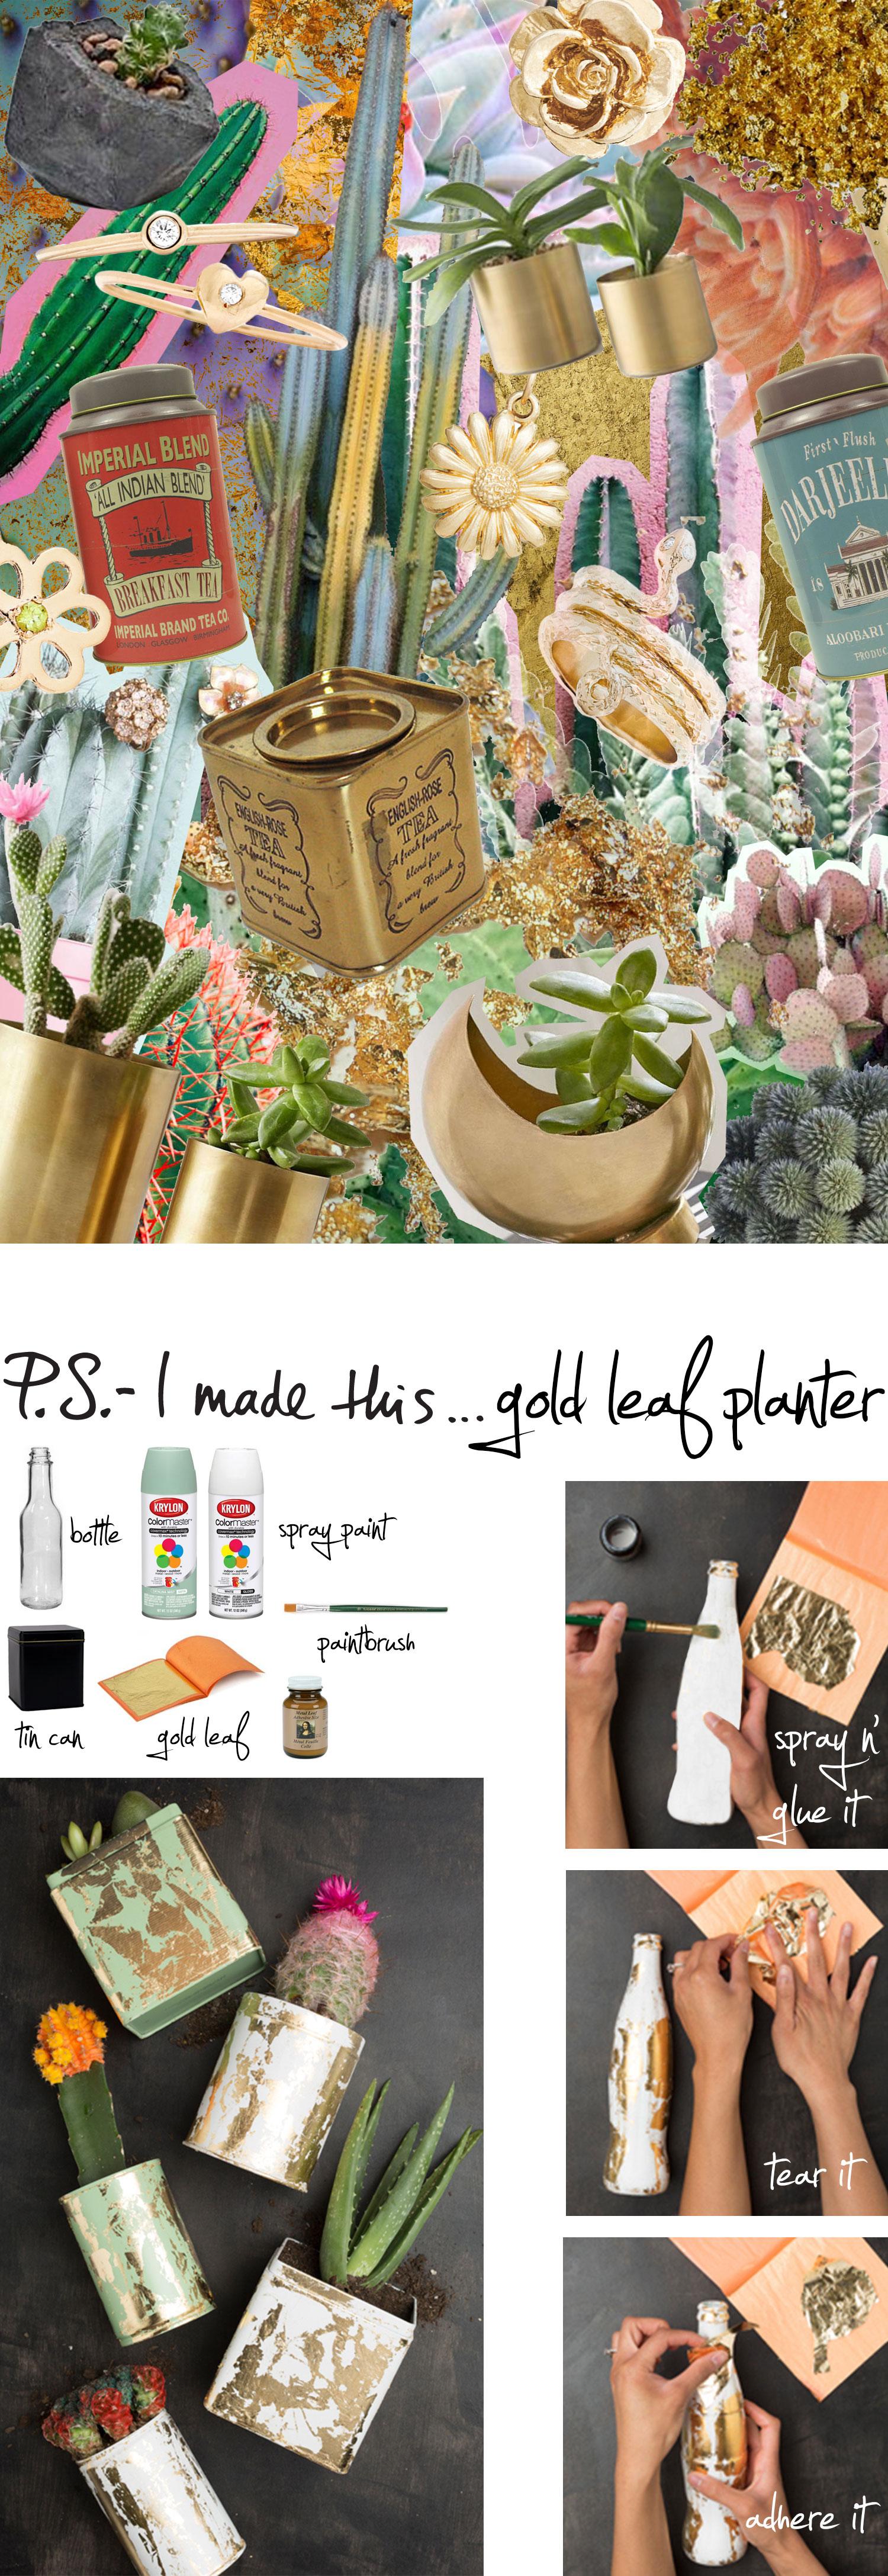 gold-leaf-planters2